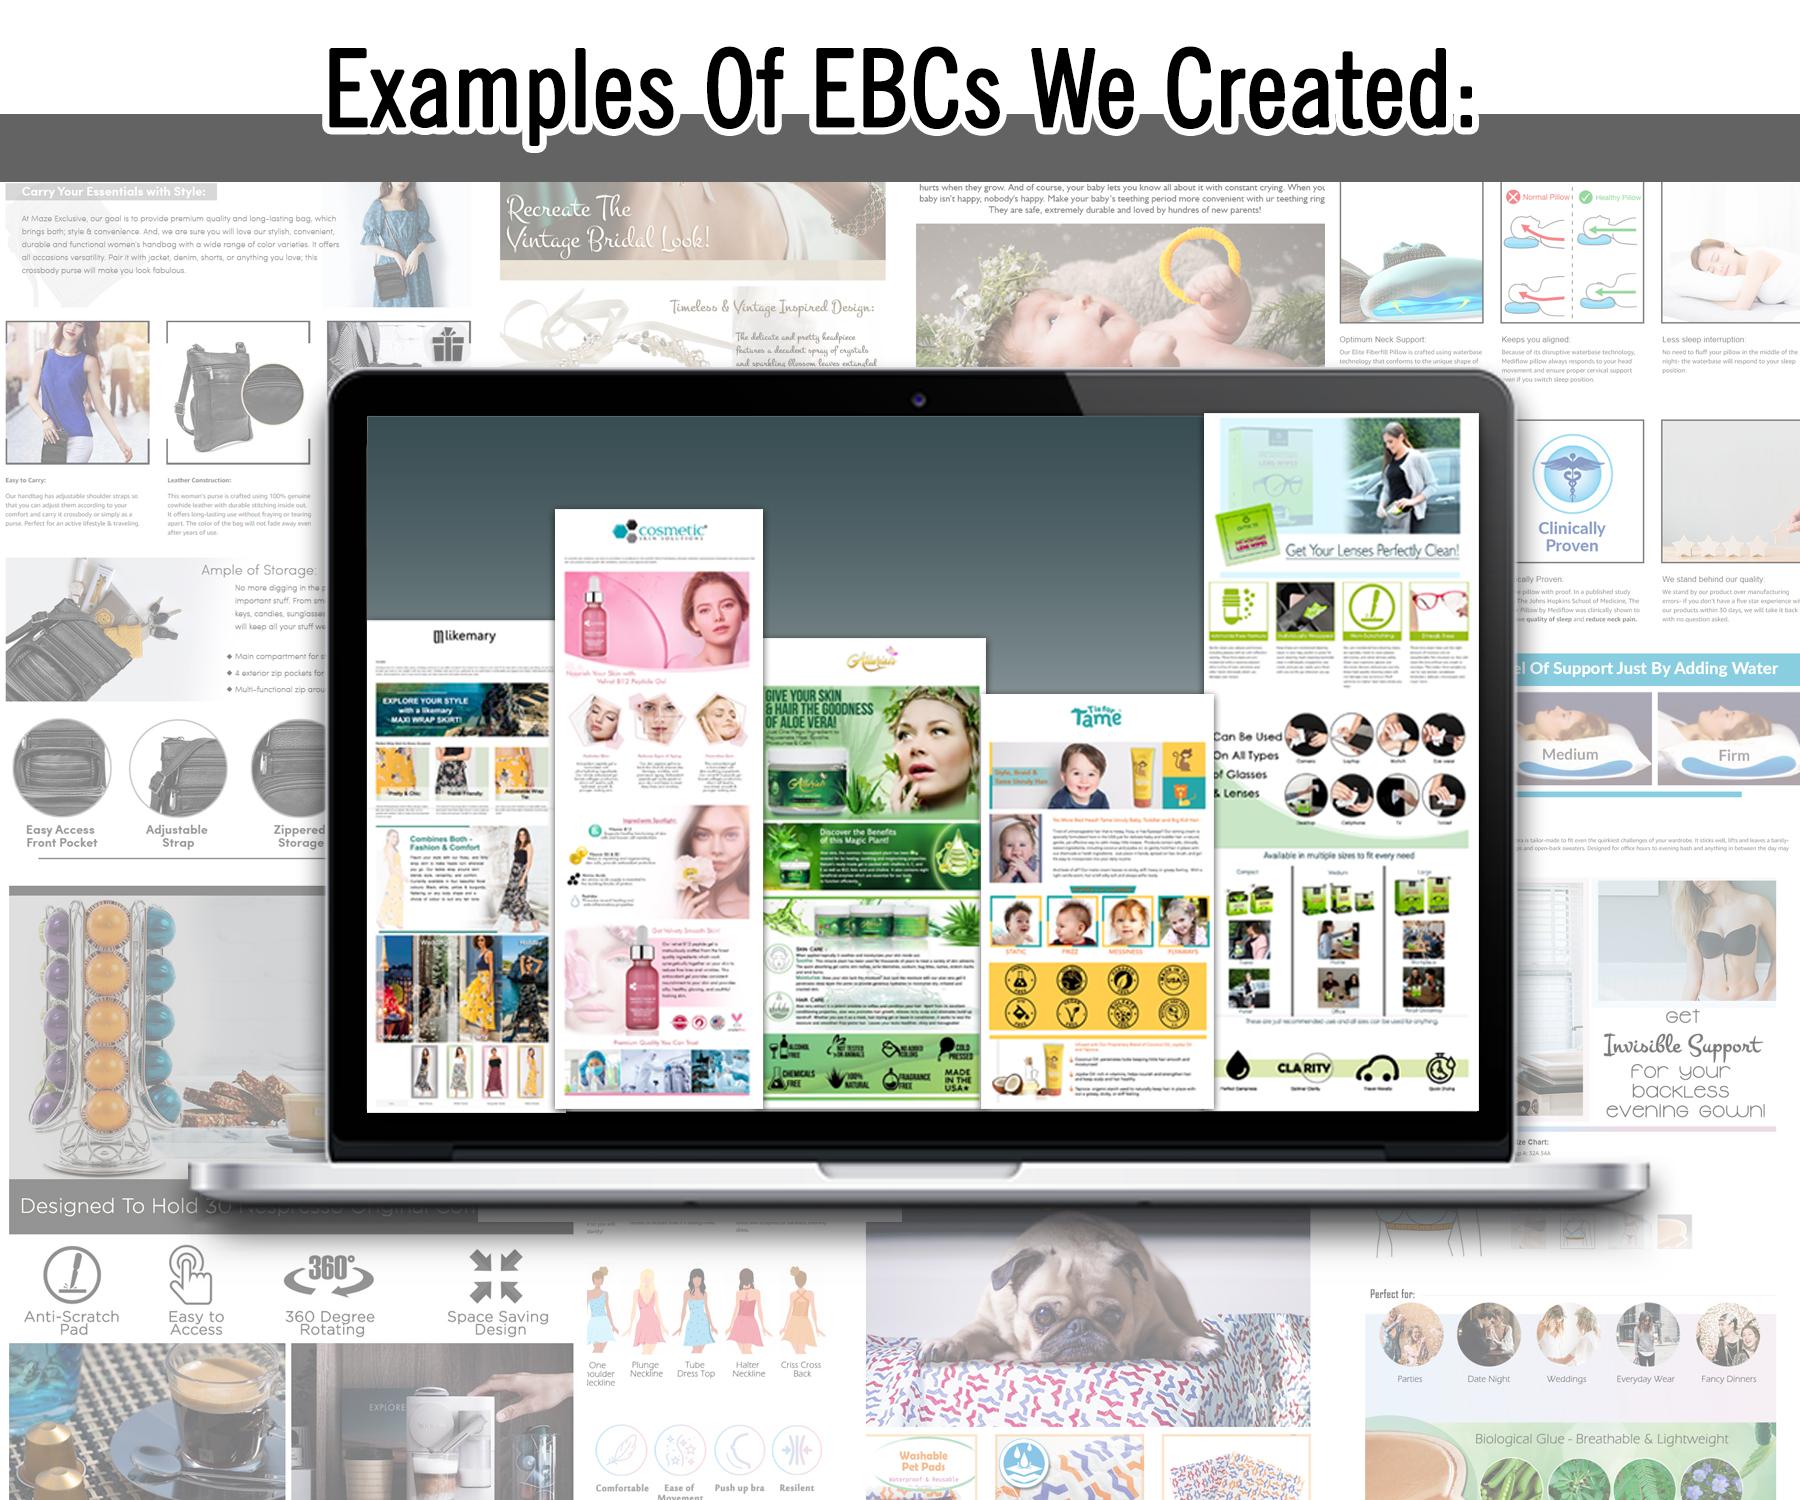 eStoreFactory EBC examples